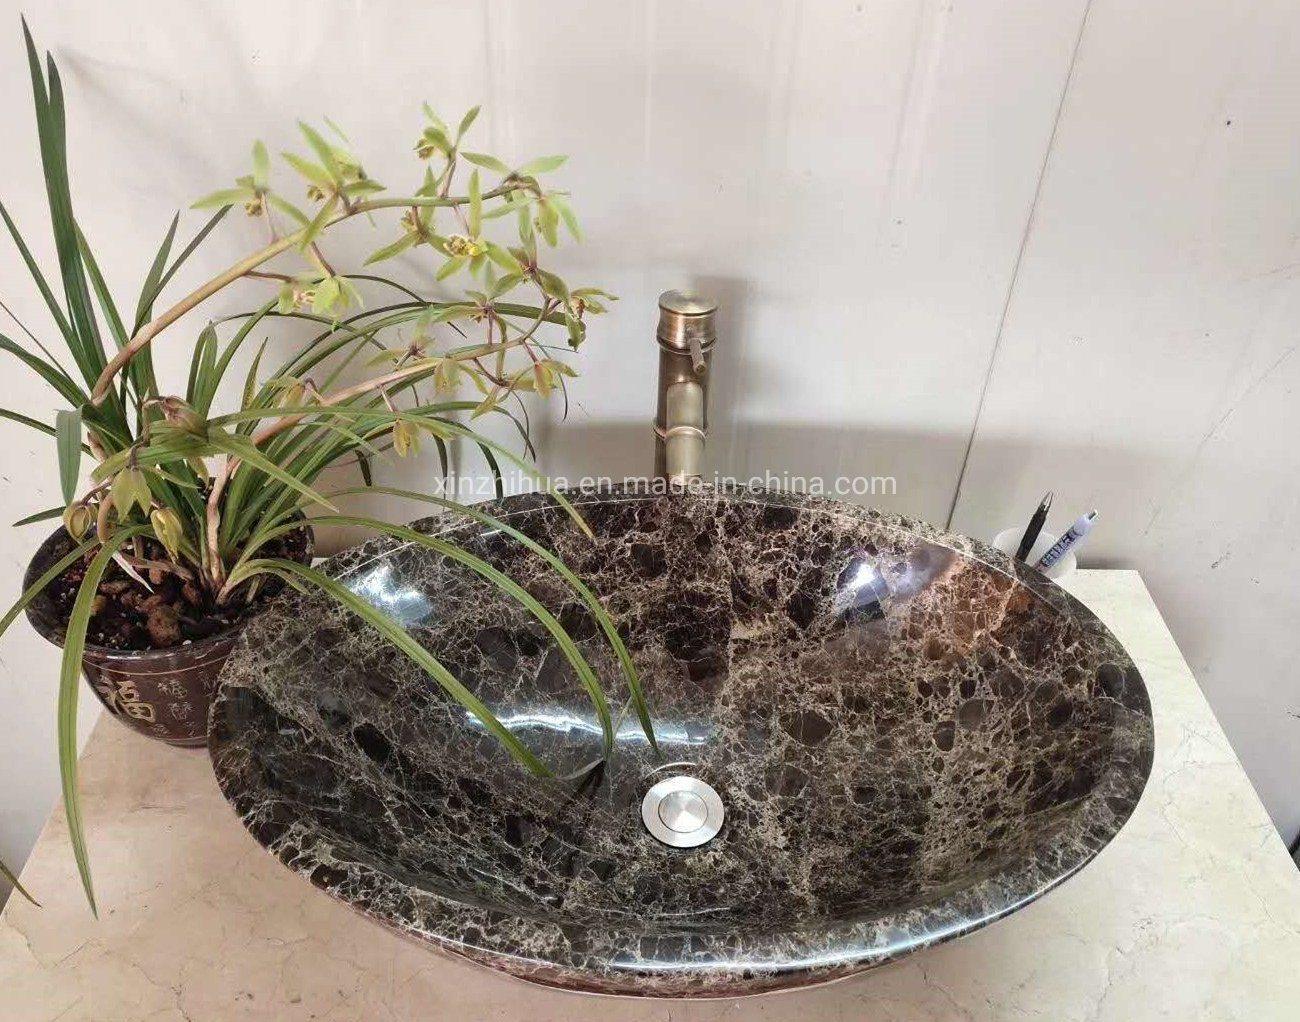 China Brown Emperador Marble Oval Round Square Bathroom Kitchen Washroom Restroom Toilet Vessel Sink Bowl Basin China Marble Marble Basin